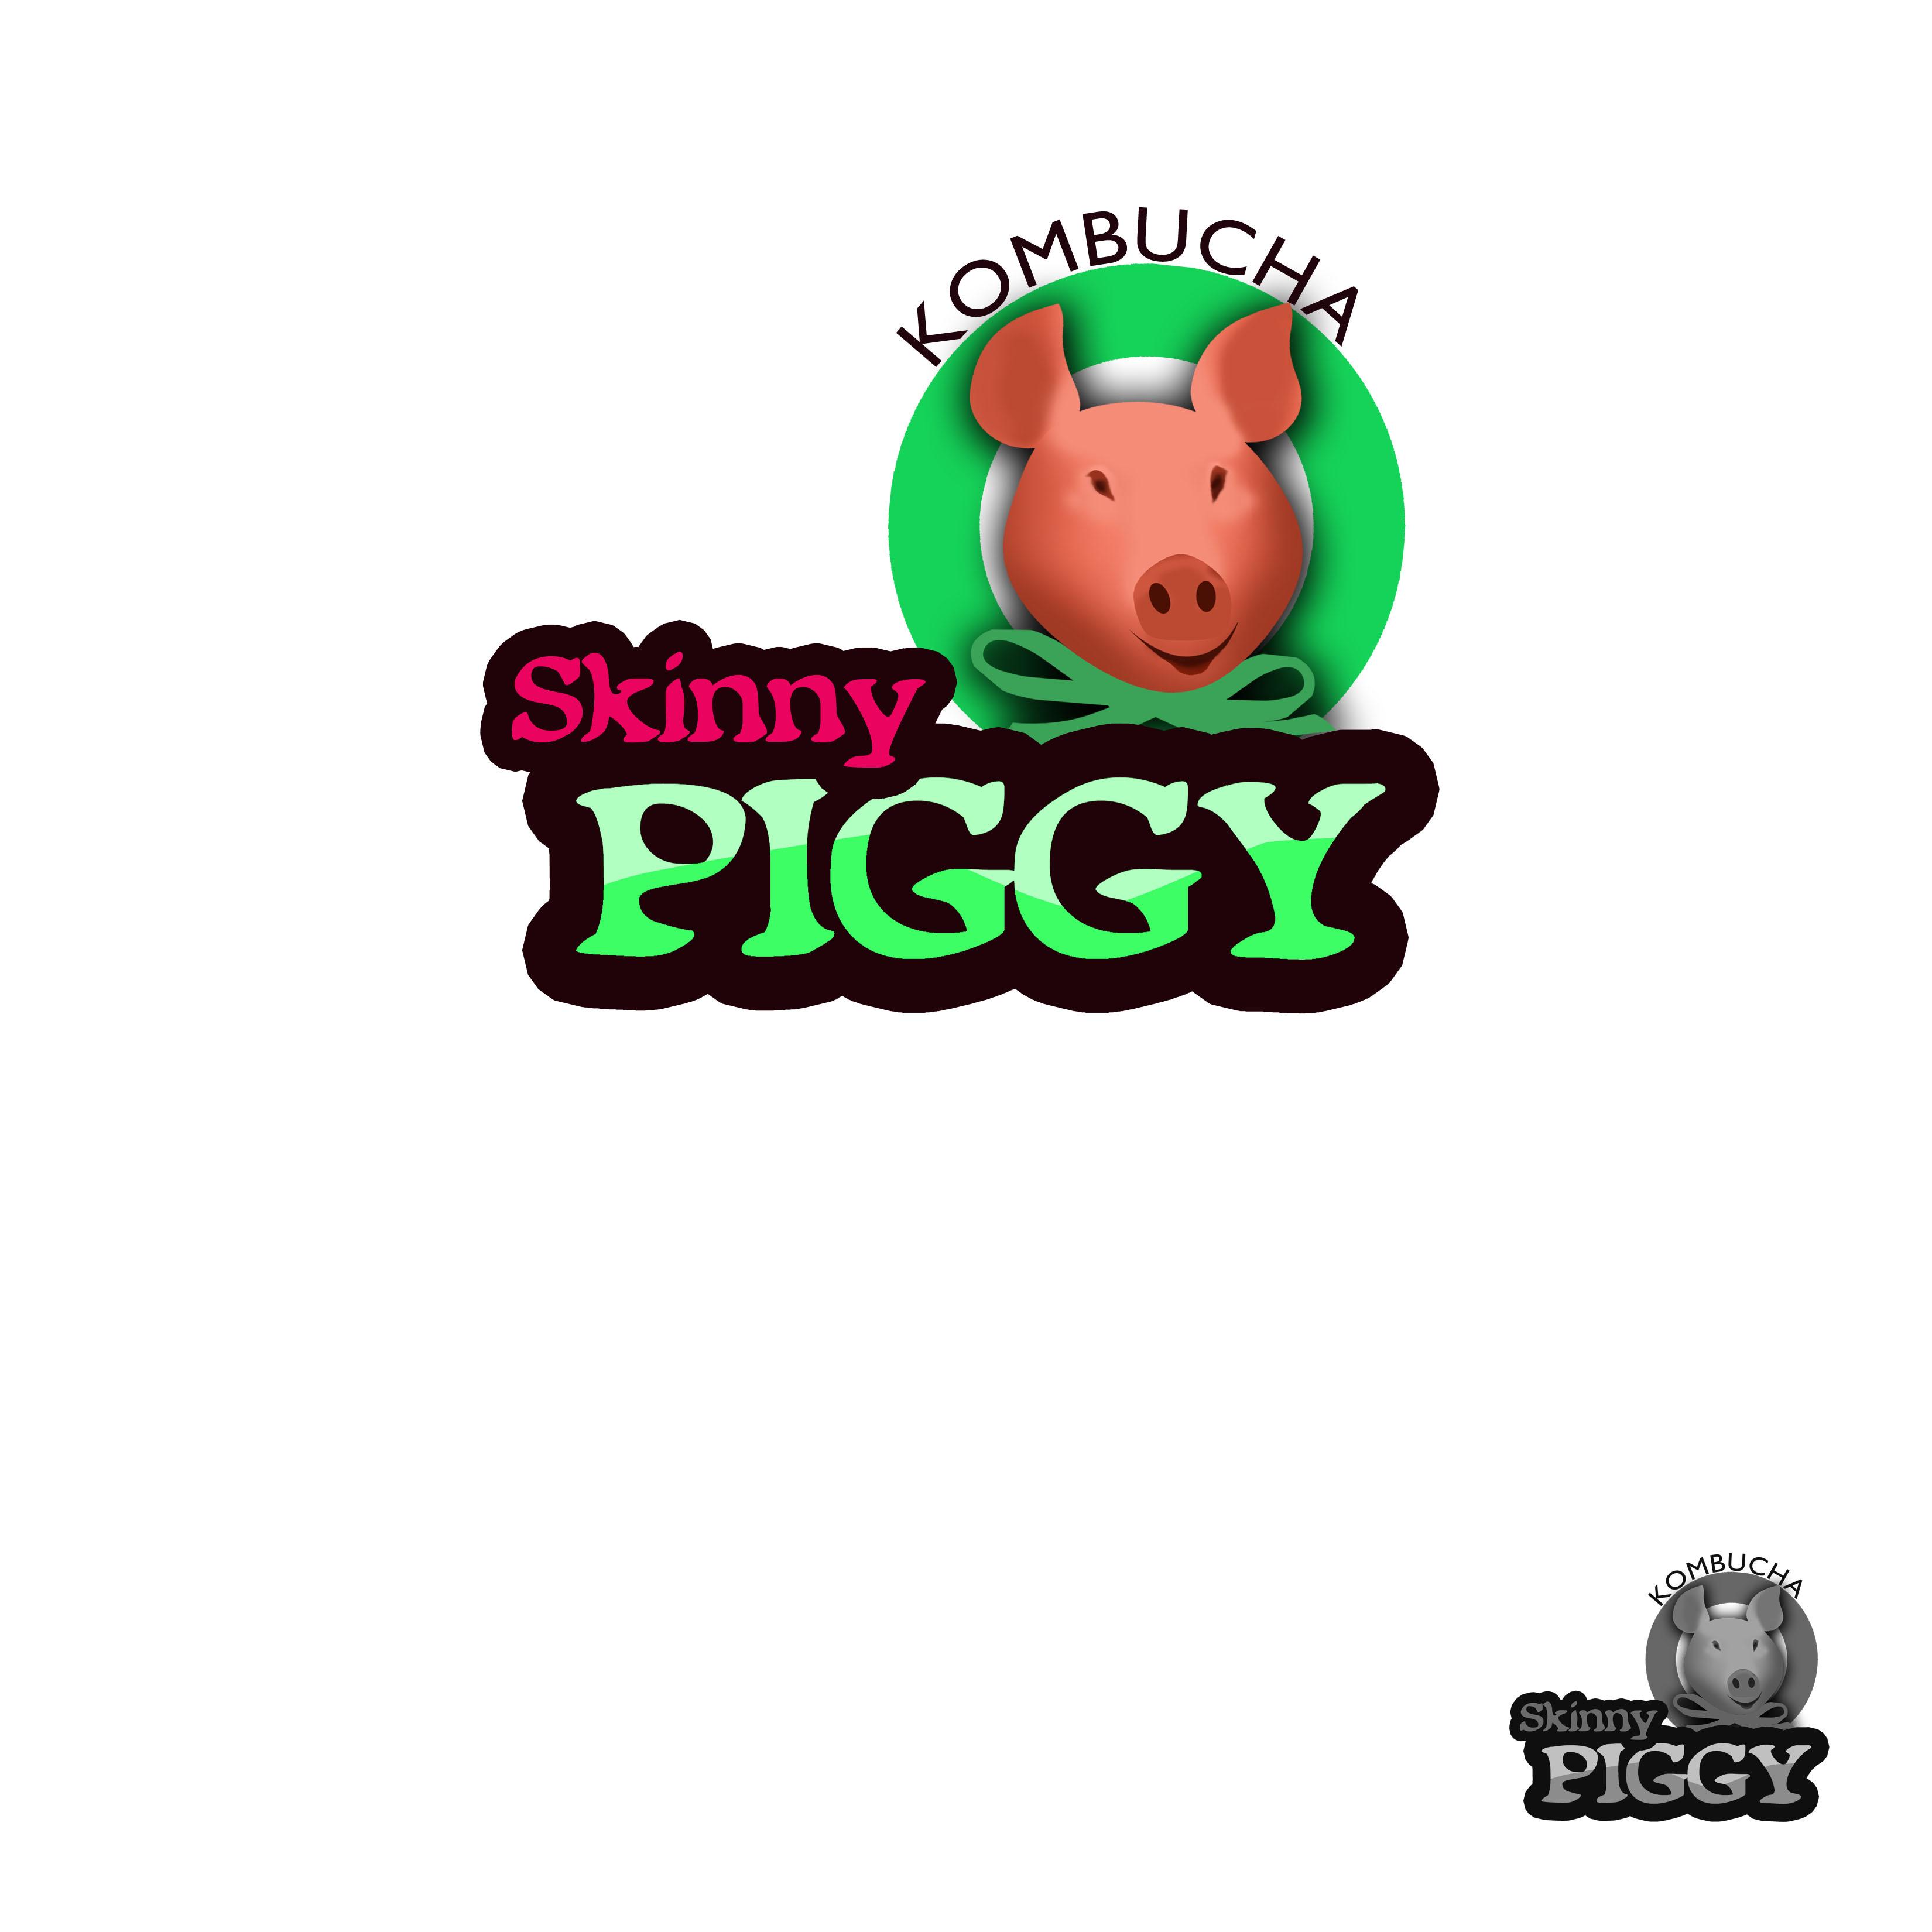 Logo Design by Alan Esclamado - Entry No. 73 in the Logo Design Contest Fun Logo Design for Skinny Piggy.